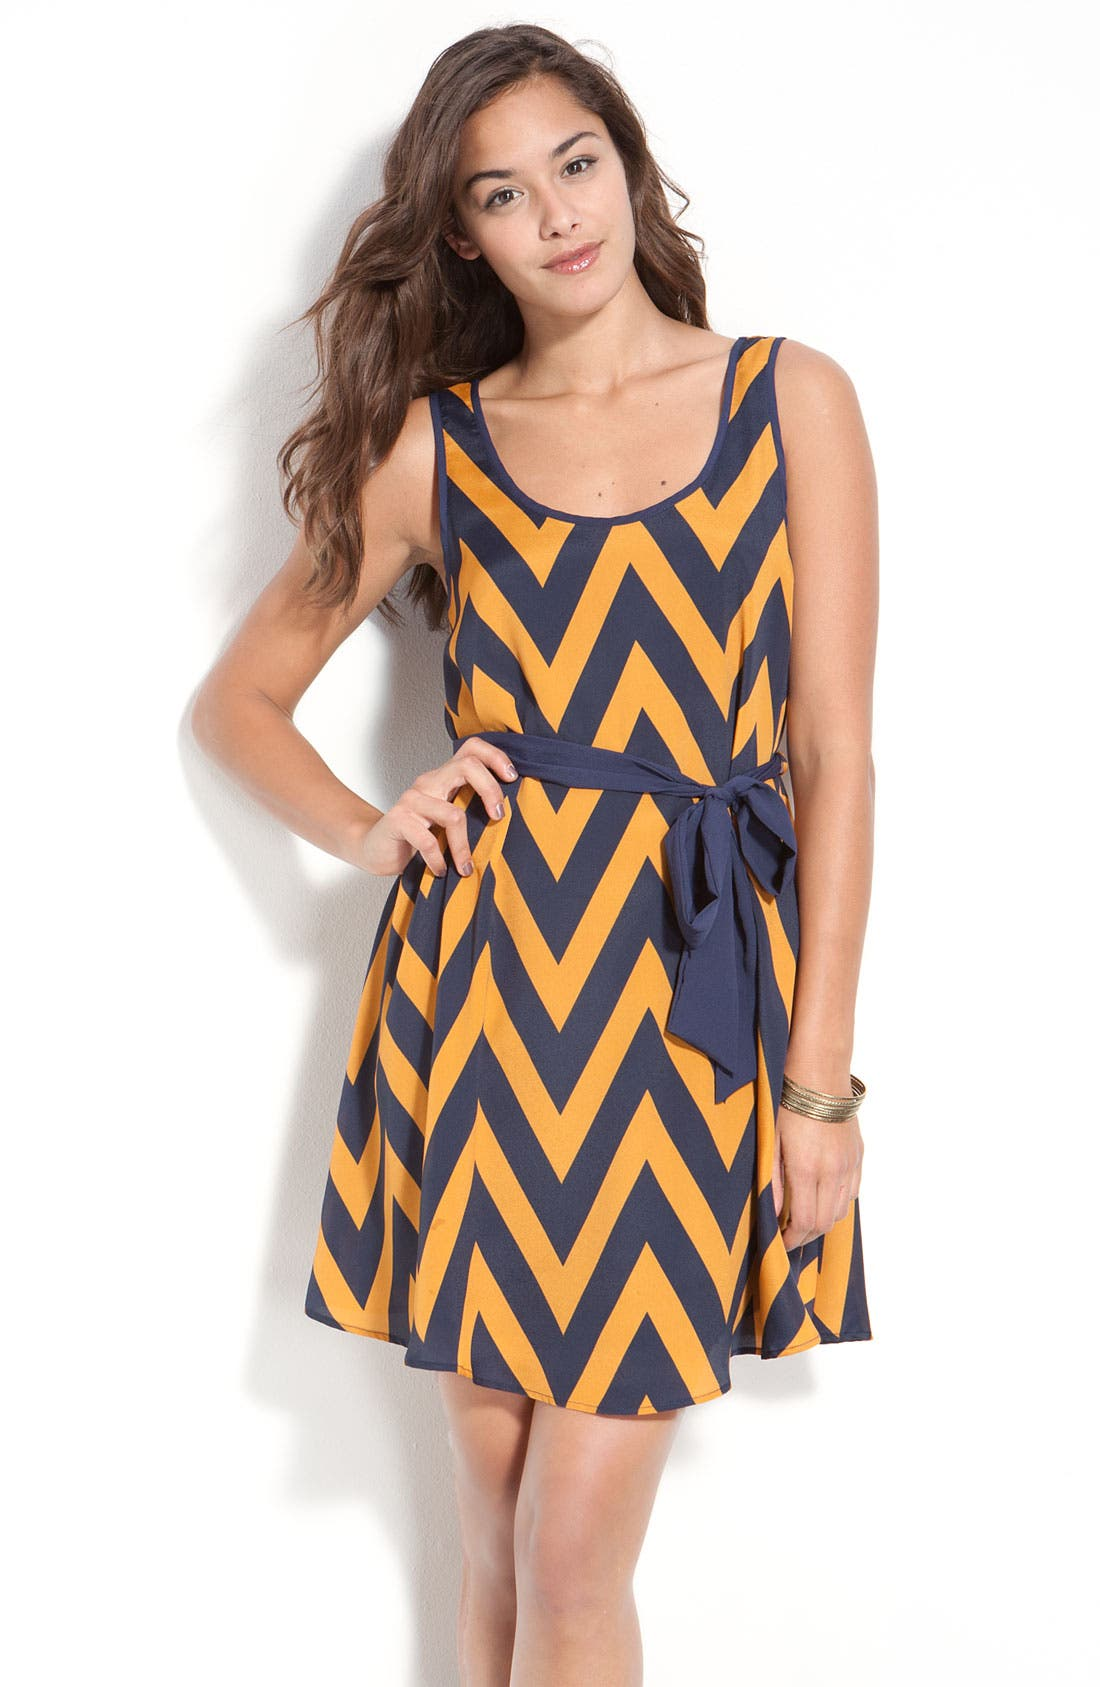 Alternate Image 1 Selected - Lush Zigzag Tank Dress (Juniors)